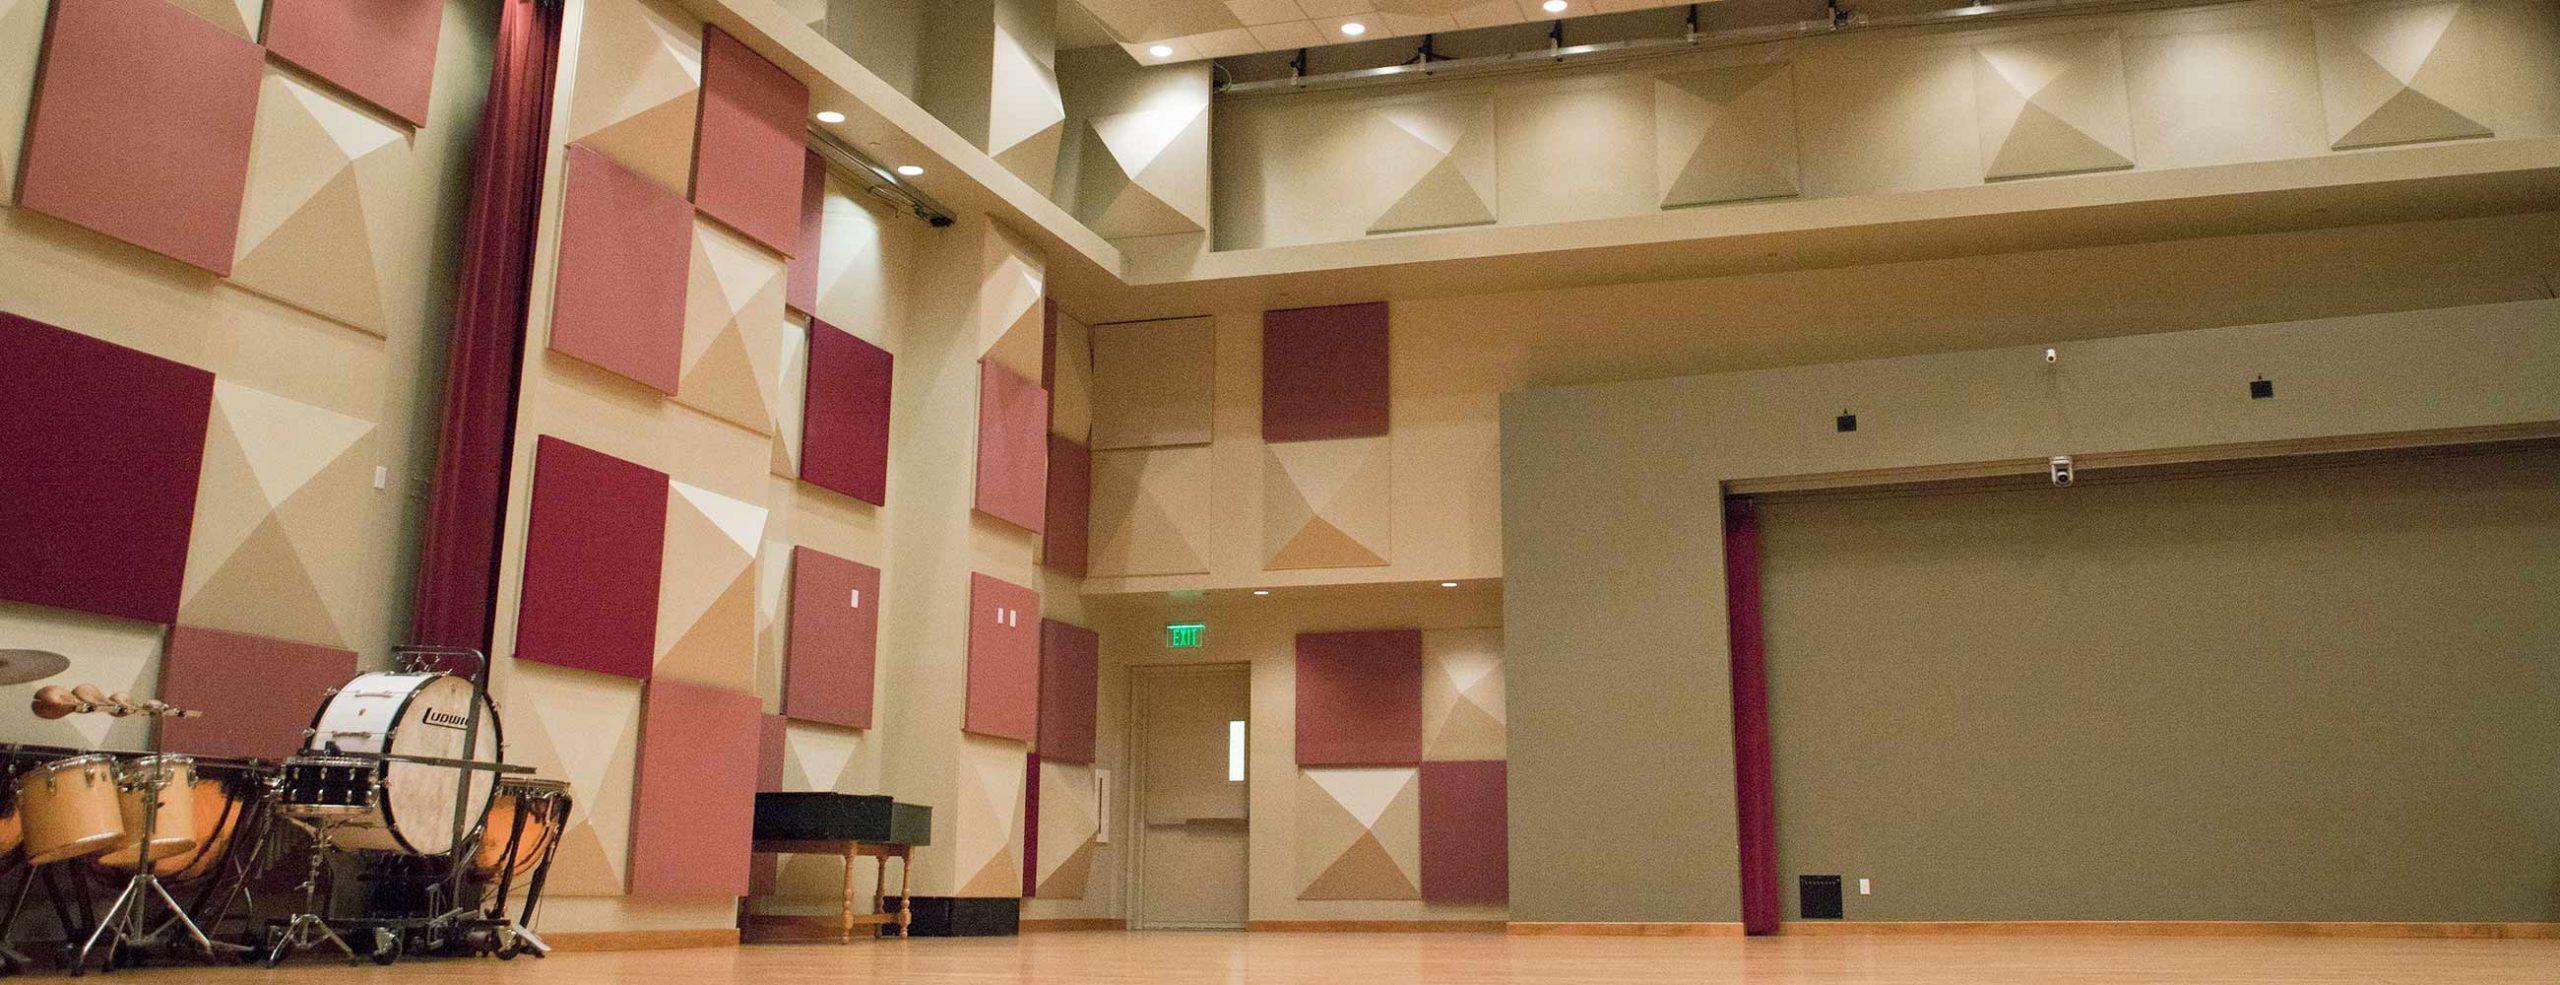 Olive Rehearsal Hall